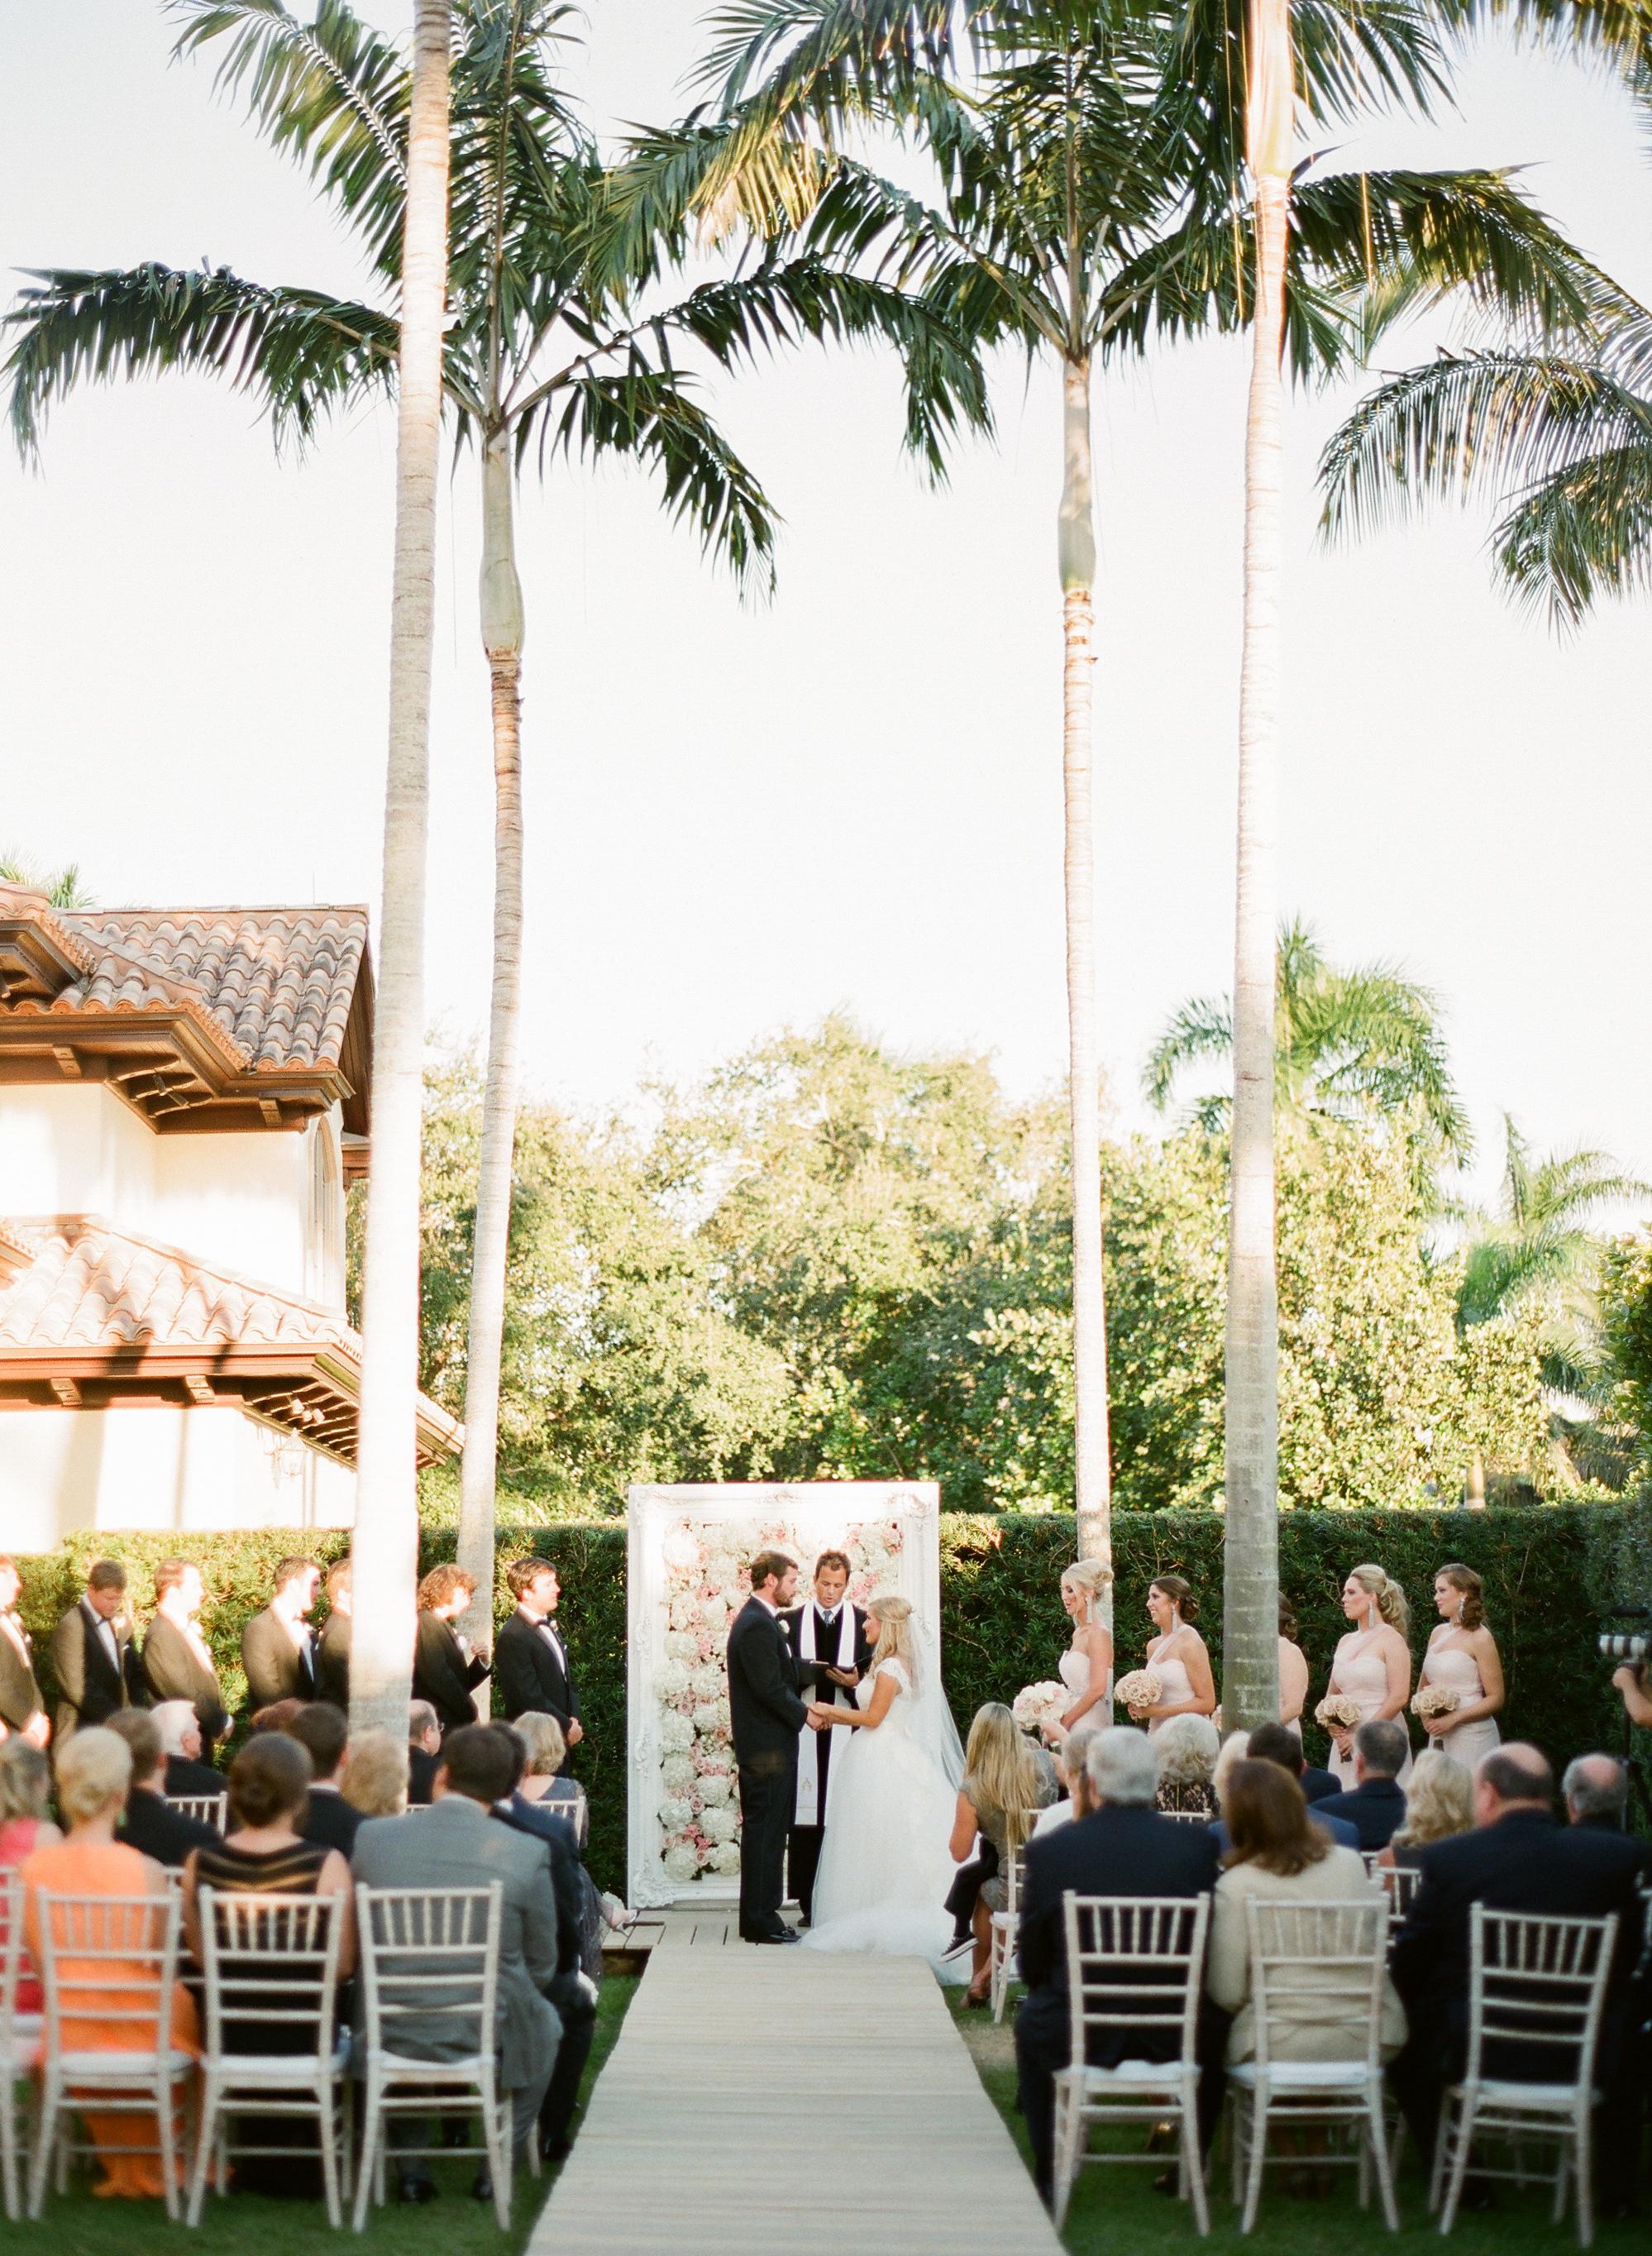 Ceci_New_York_Florida_Wedding_Style_Bride_Watercolor_Real_Custom_Luxury_73.jpg